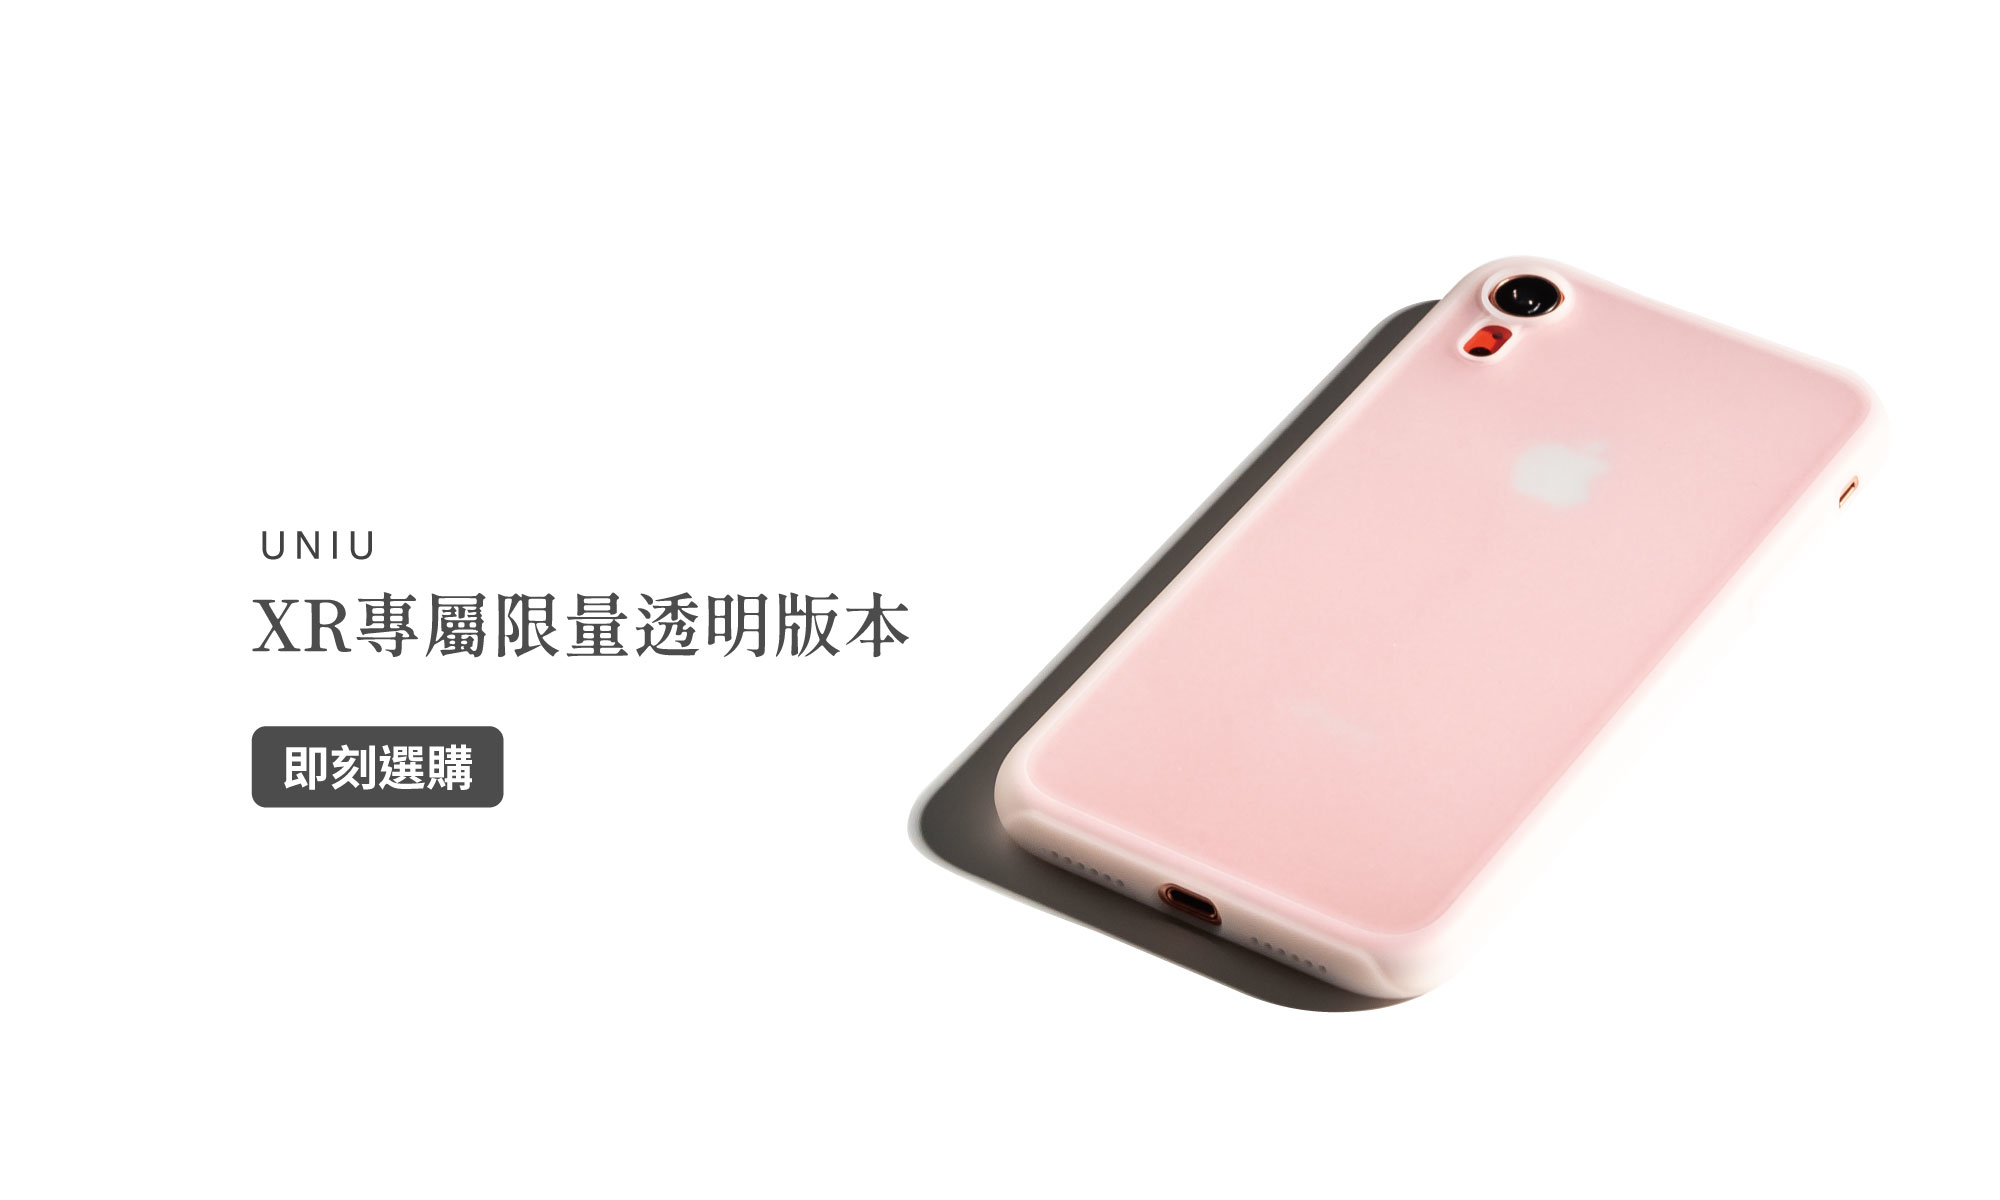 UNIU XR透明 iphone保護殼